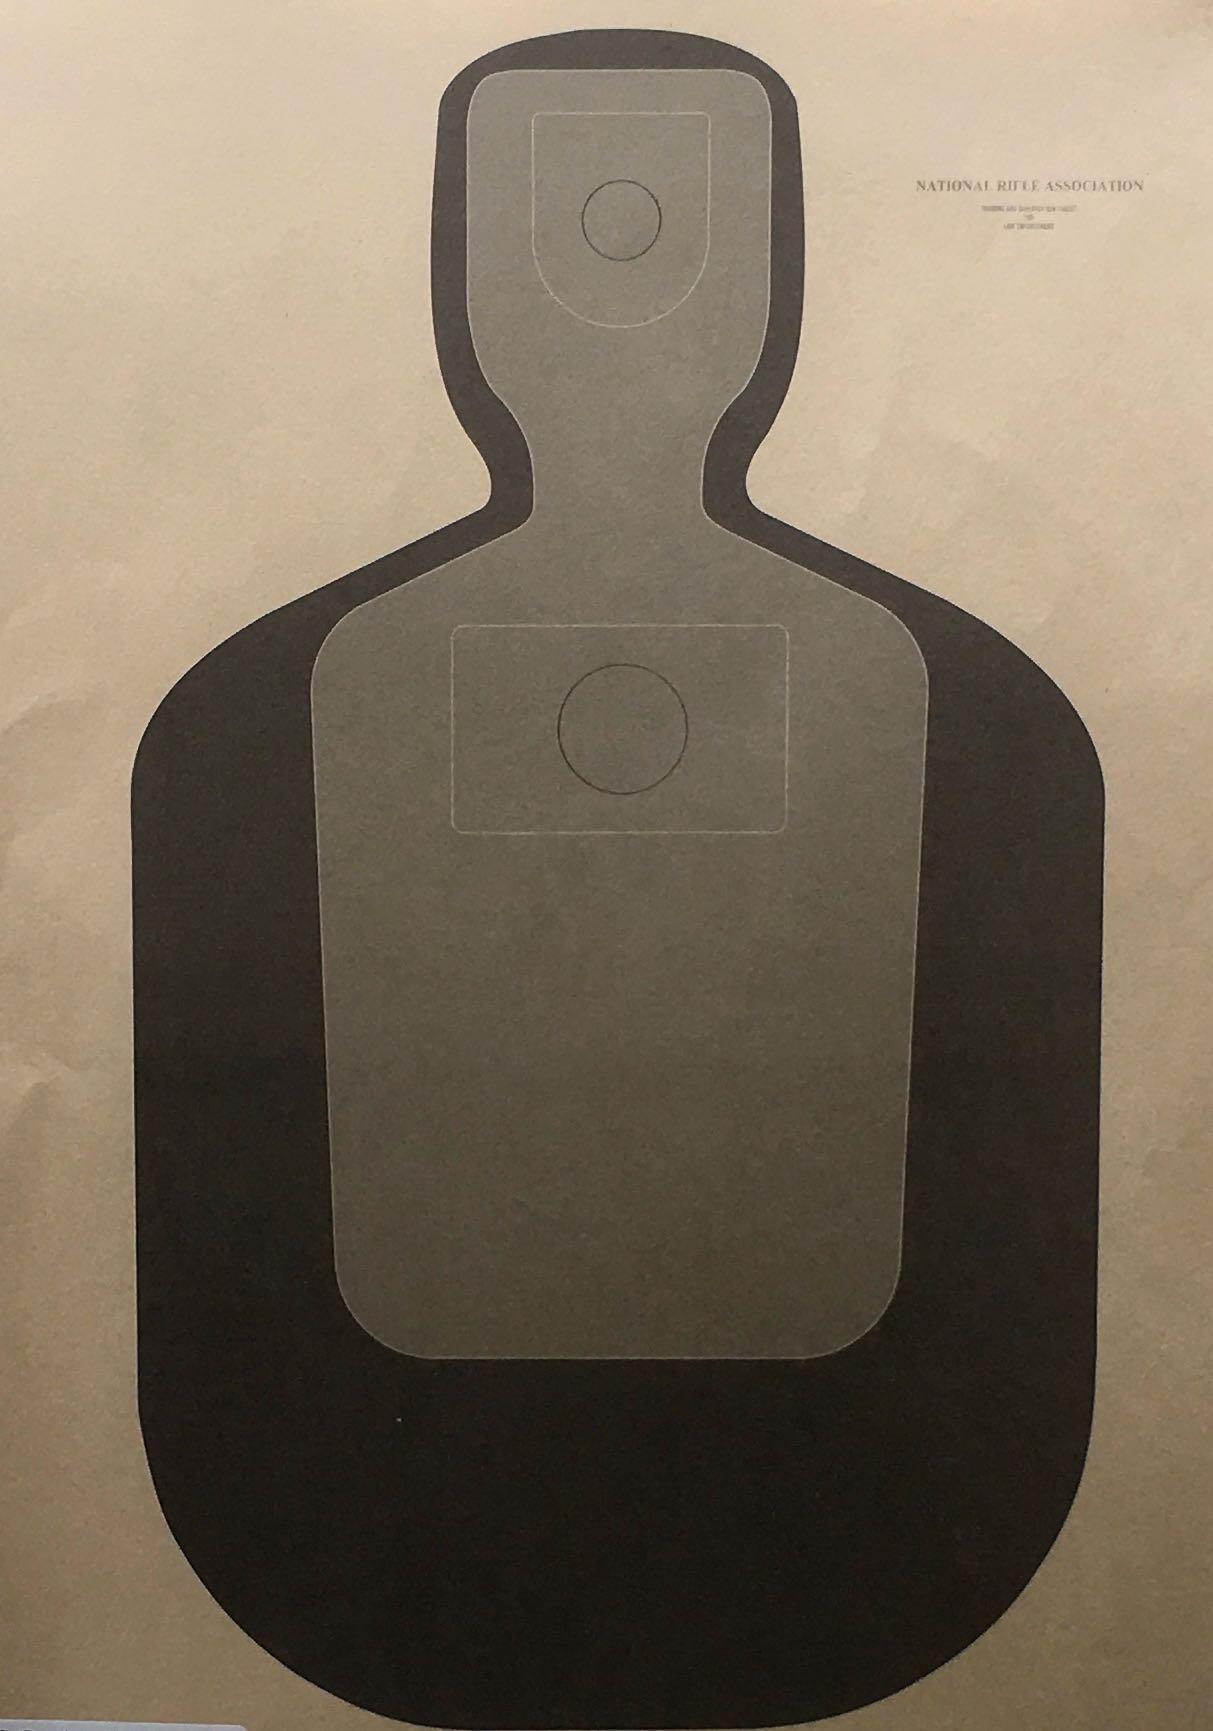 tq-20-target